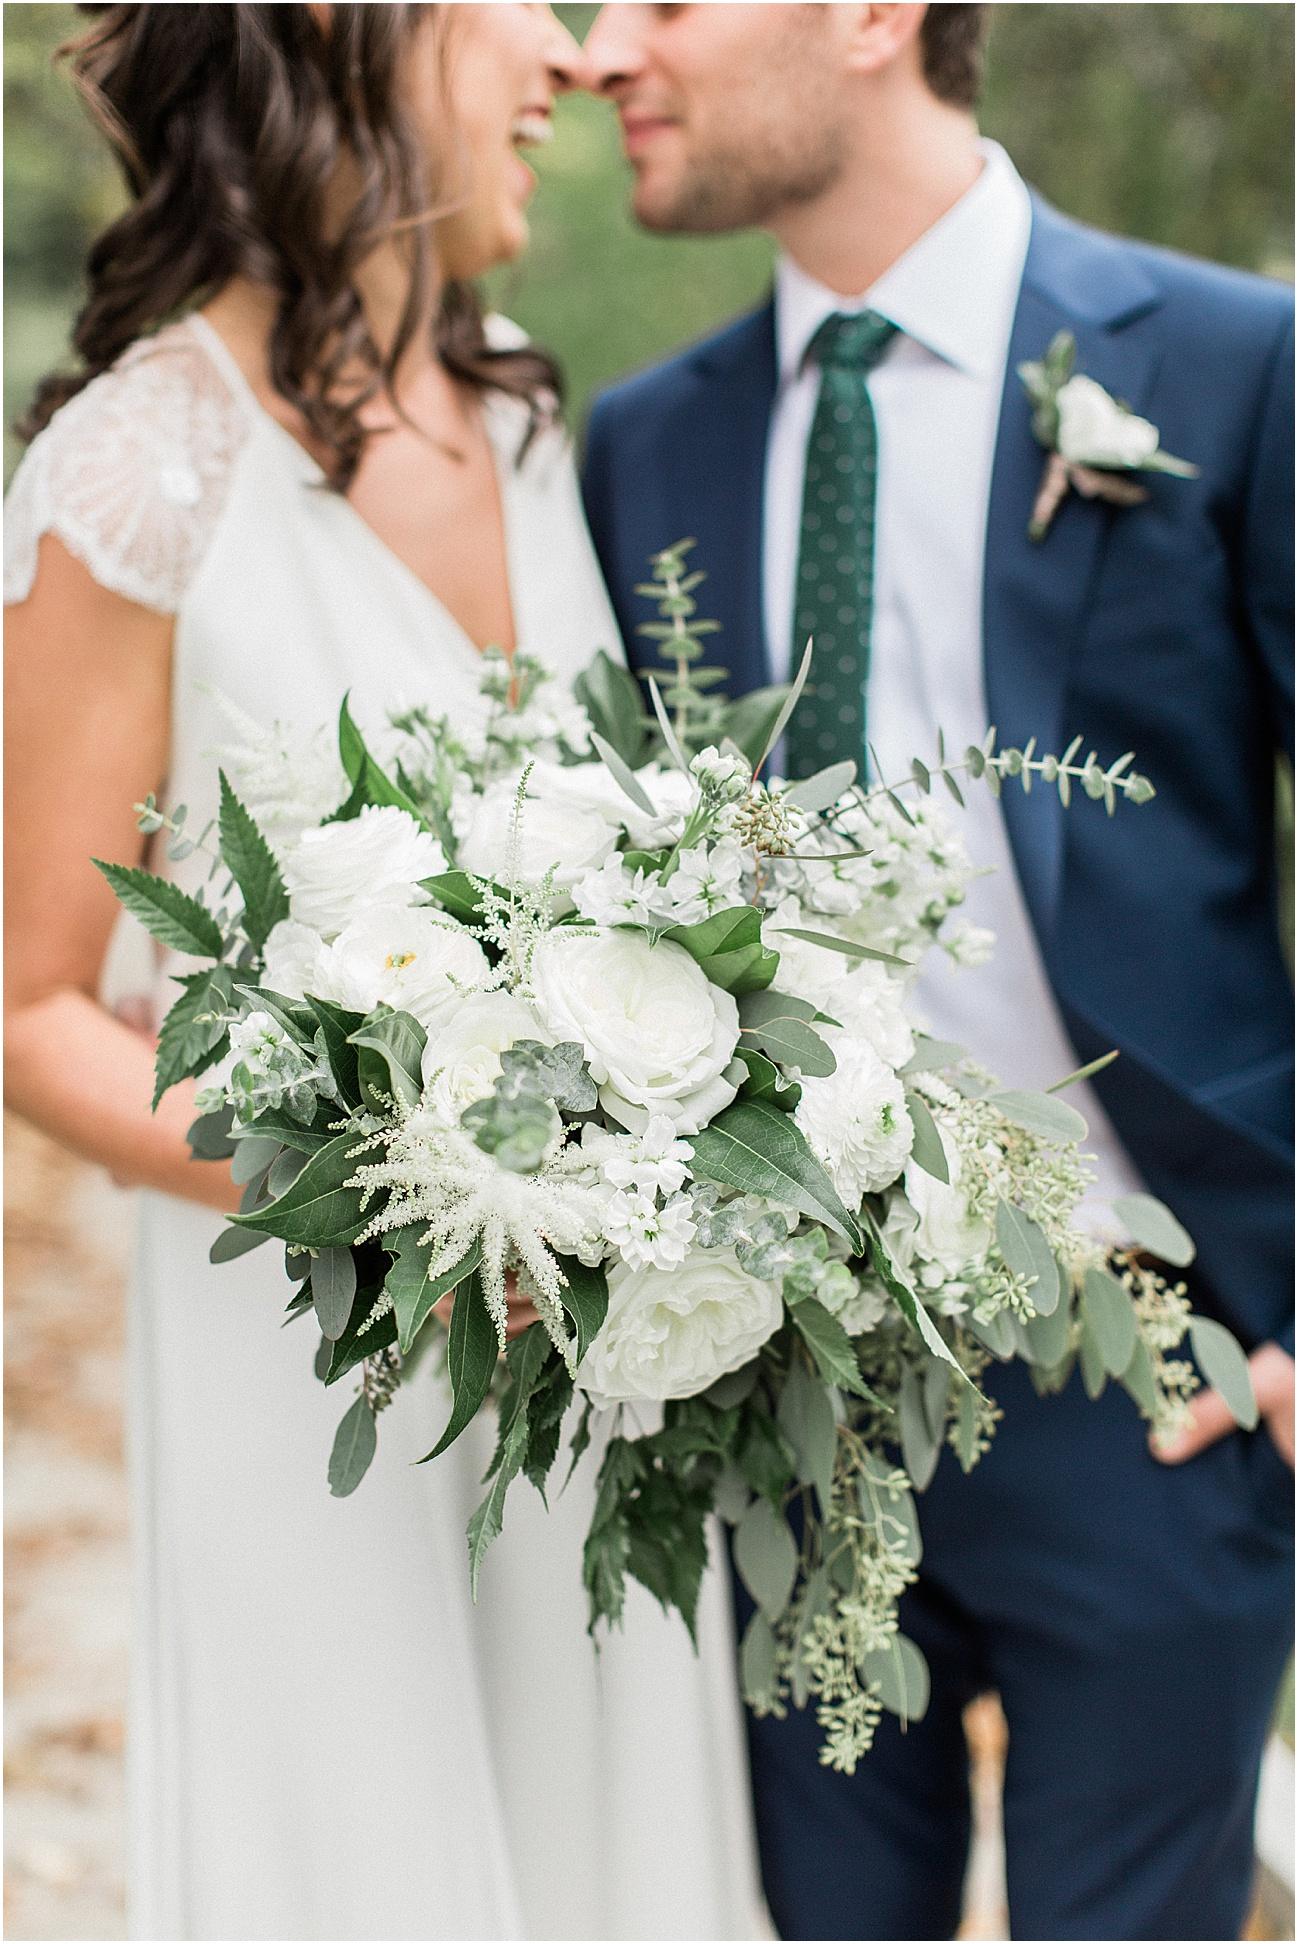 jenna_mike_willowdale_estate_topsfield_neutral_whites_greens_fall_cape_cod_boston_wedding_photographer_meredith_jane_photography_photo_1431.jpg